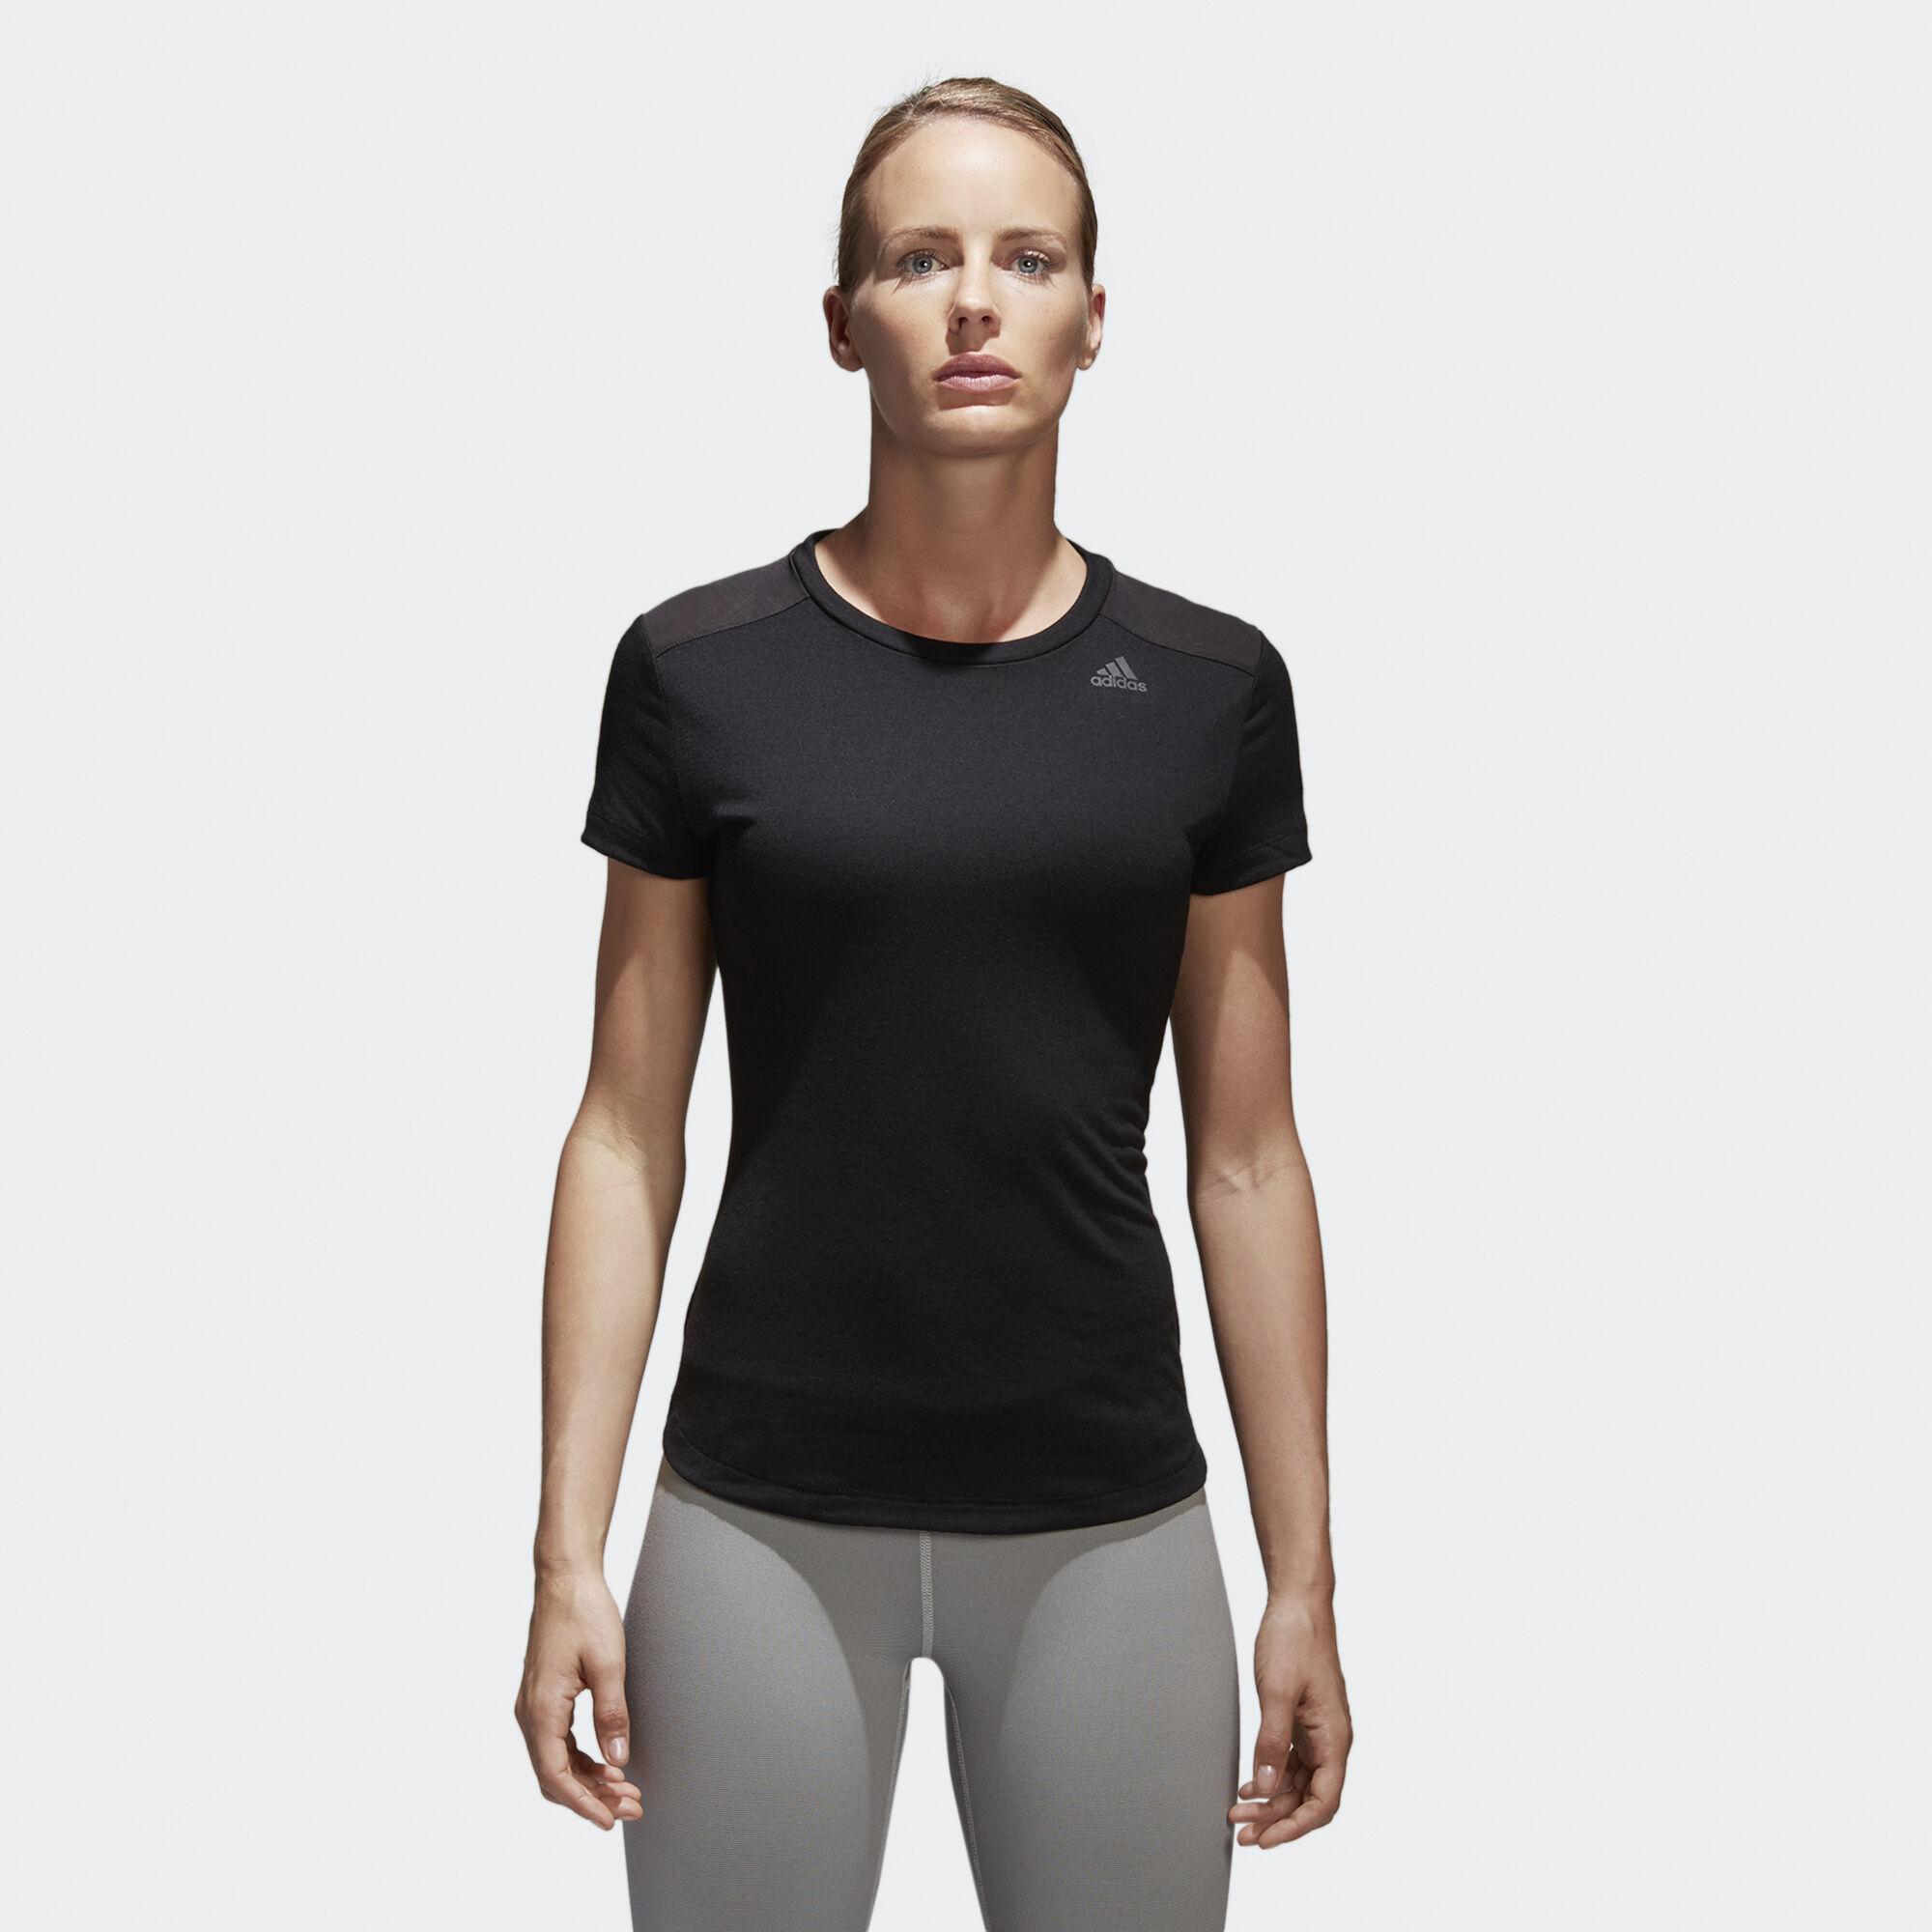 adidas - PRIME TEE MIX Black BQ5799. Women Training